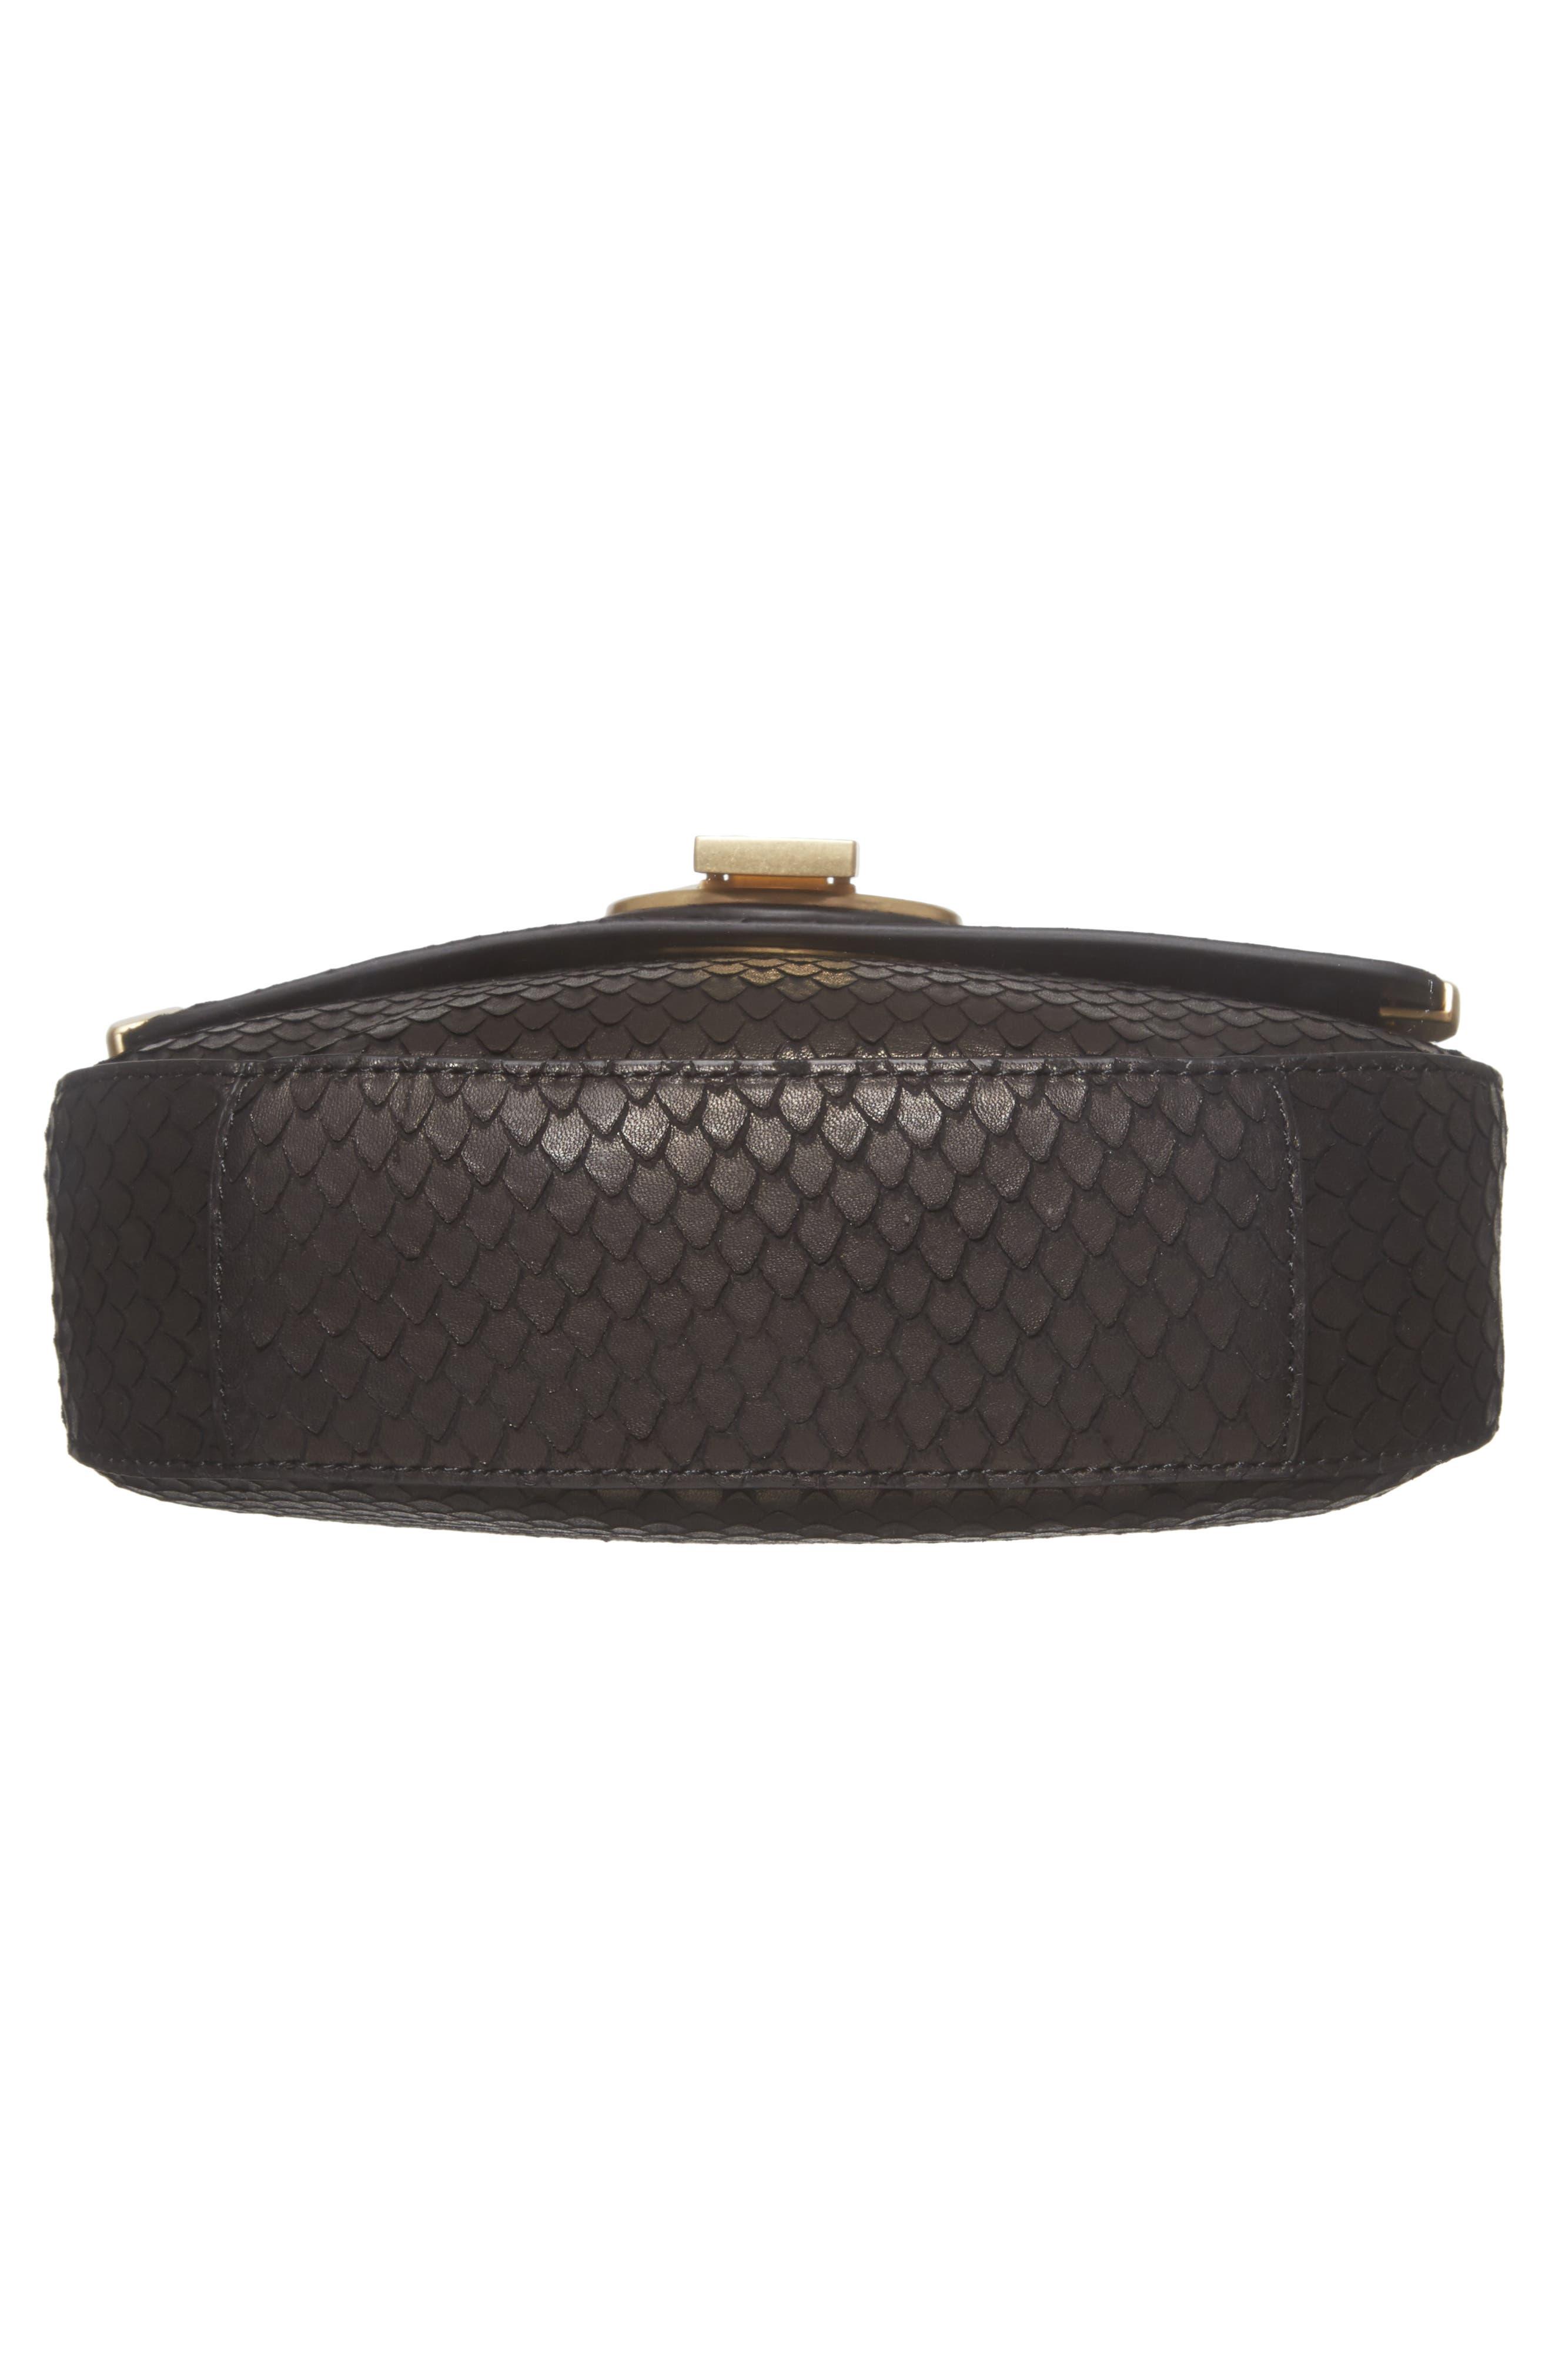 Céline Dion Octave Leather Crossbody Bag,                             Alternate thumbnail 6, color,